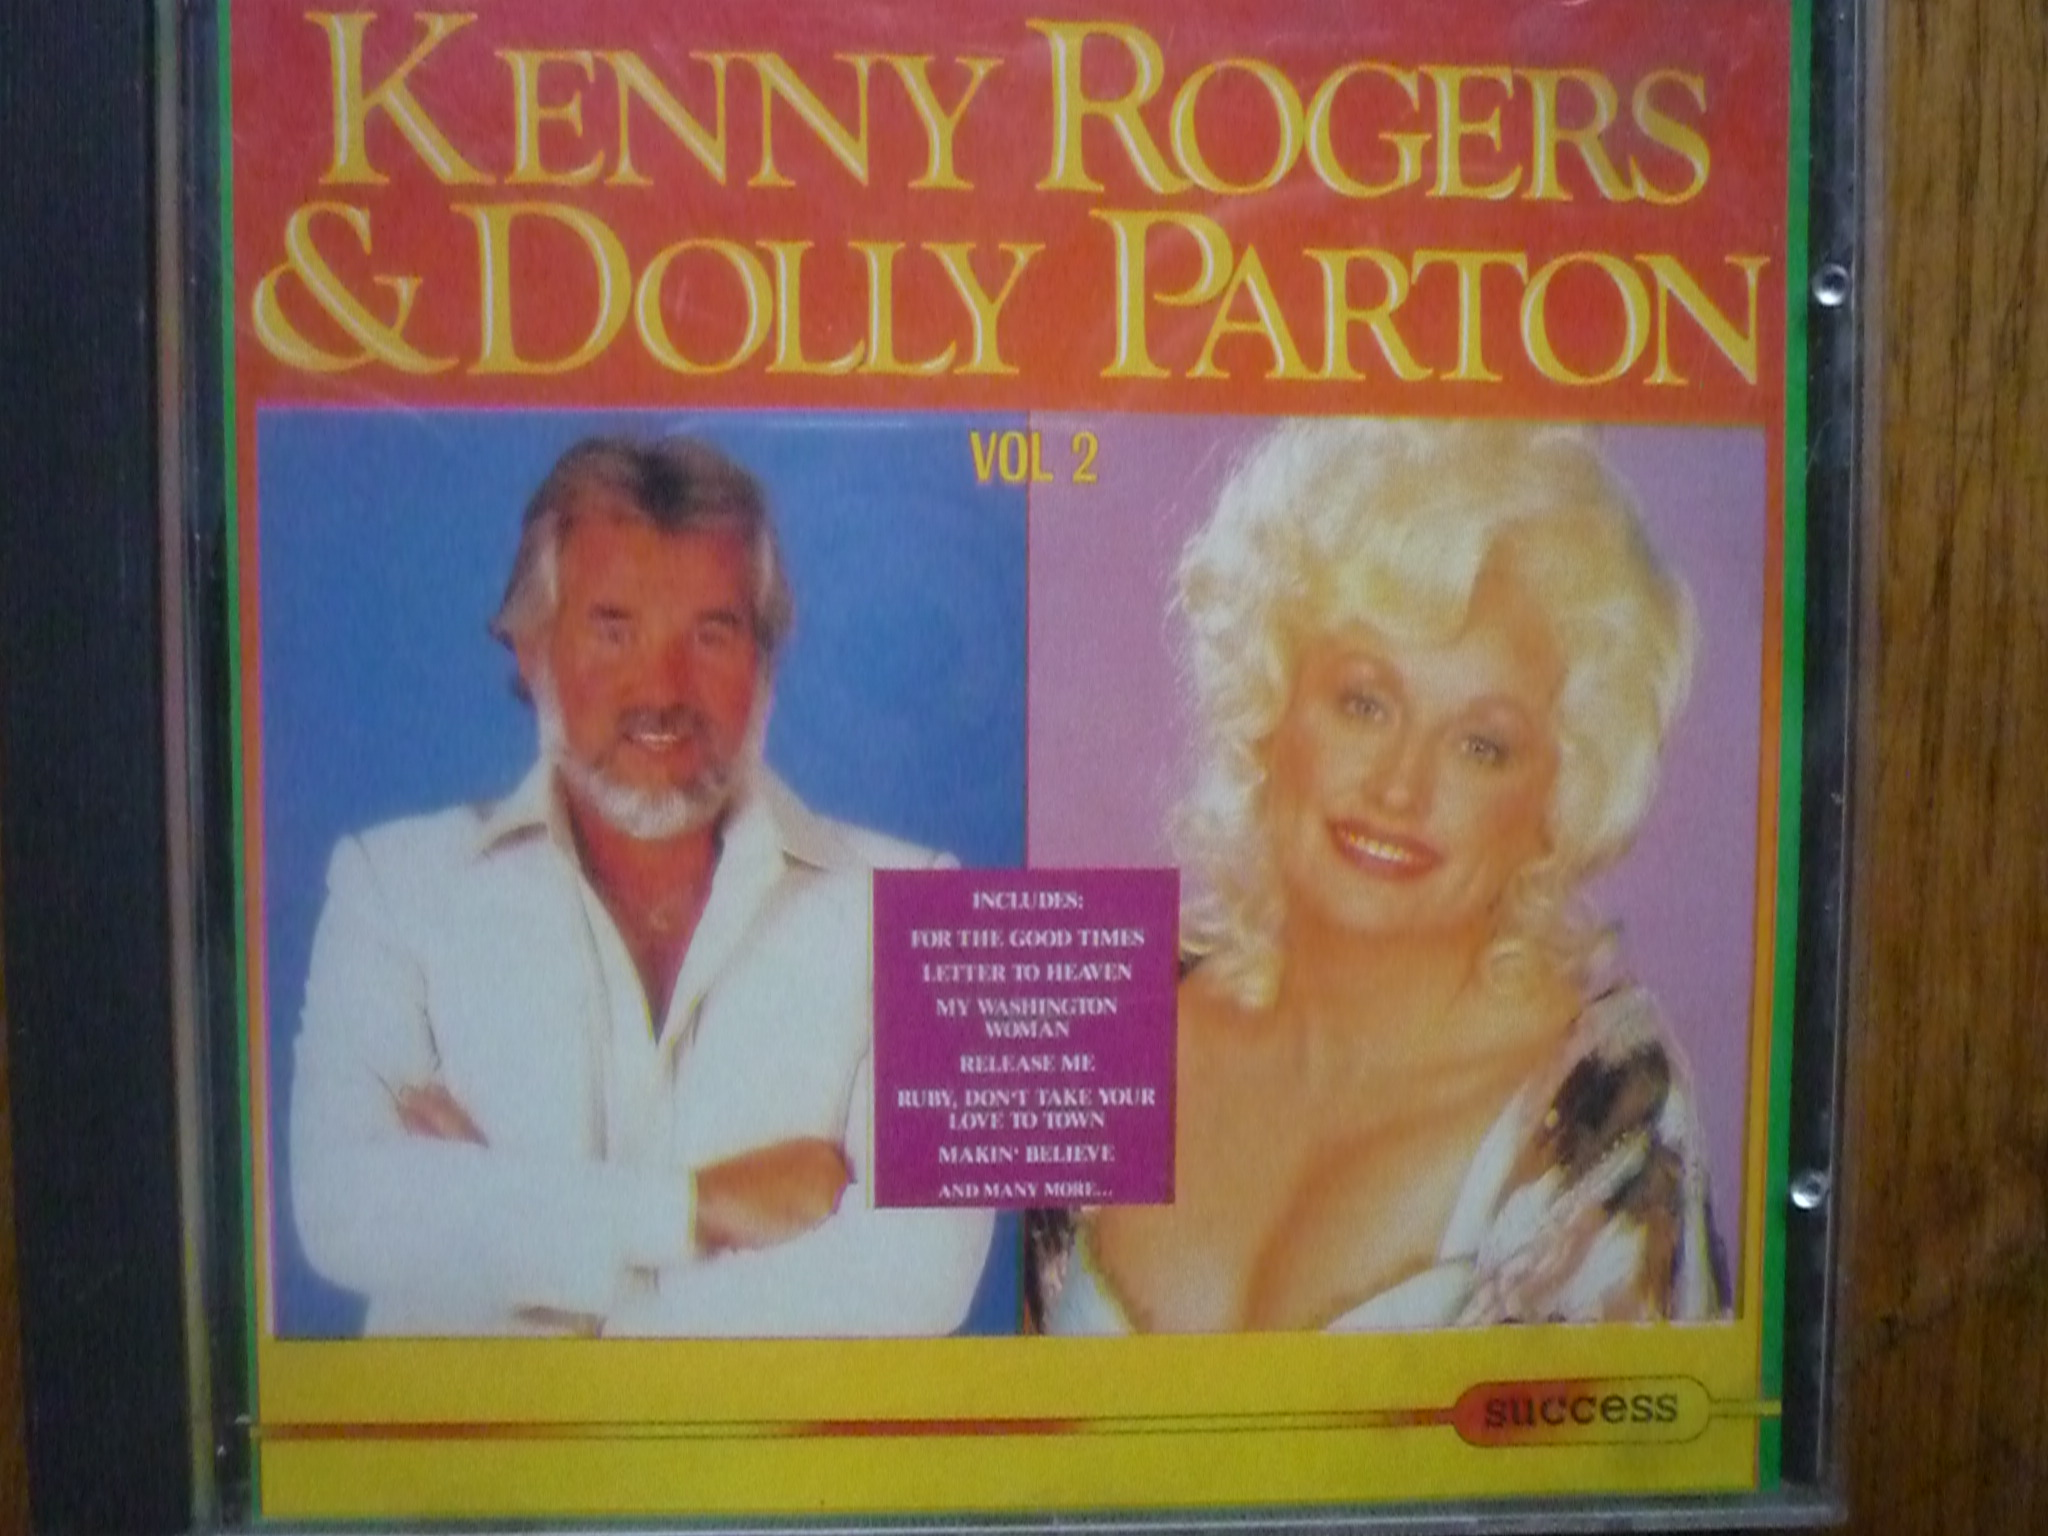 KENNY ROGERS & DOLLY PARTON VOL 2 CD